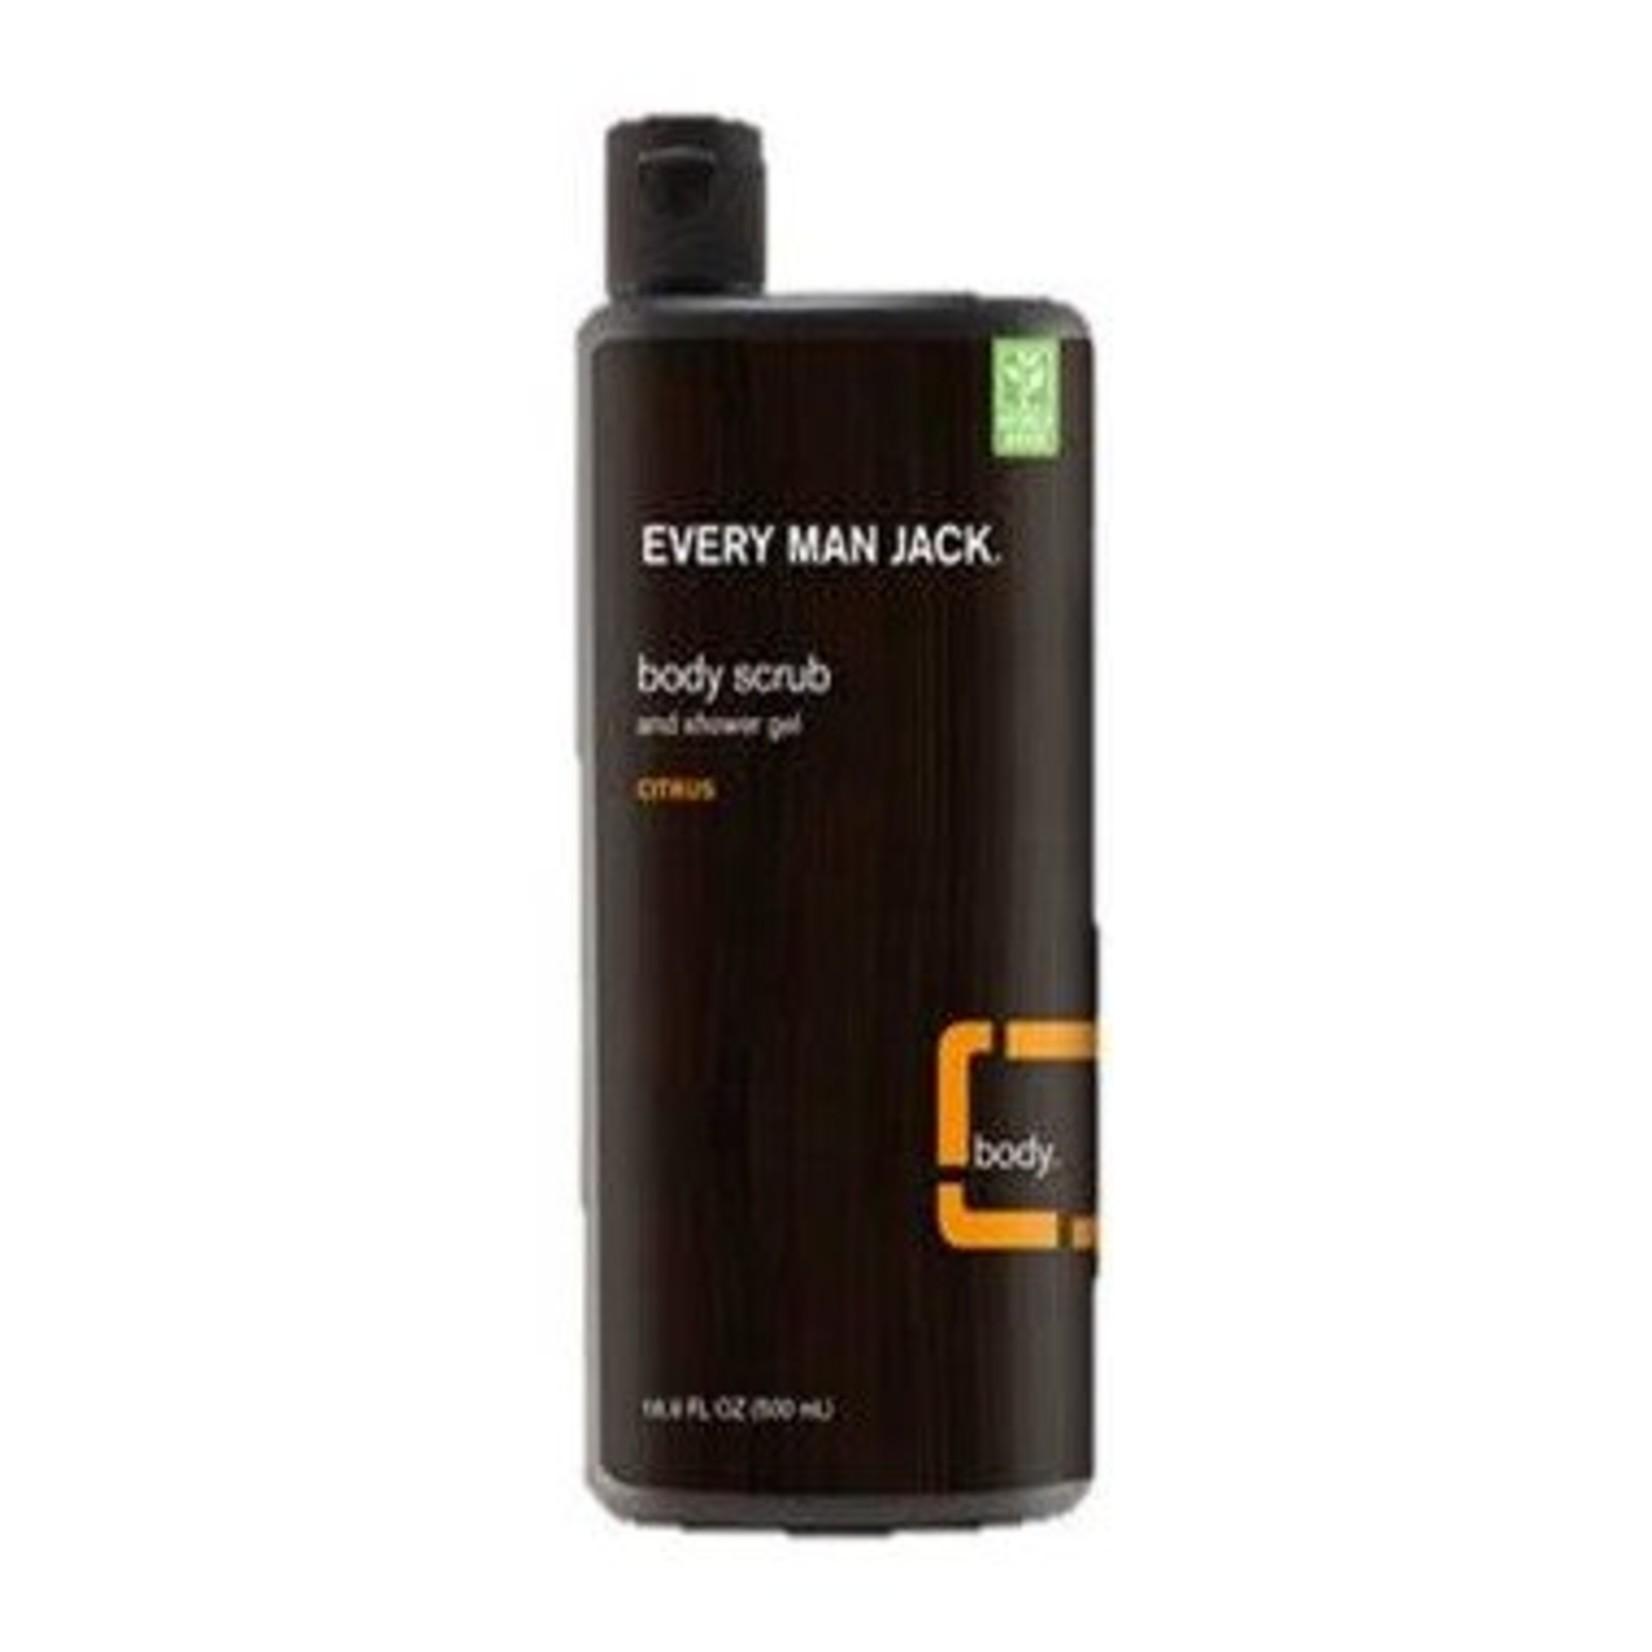 Every Man Jack Body Srub Citrus 400ml